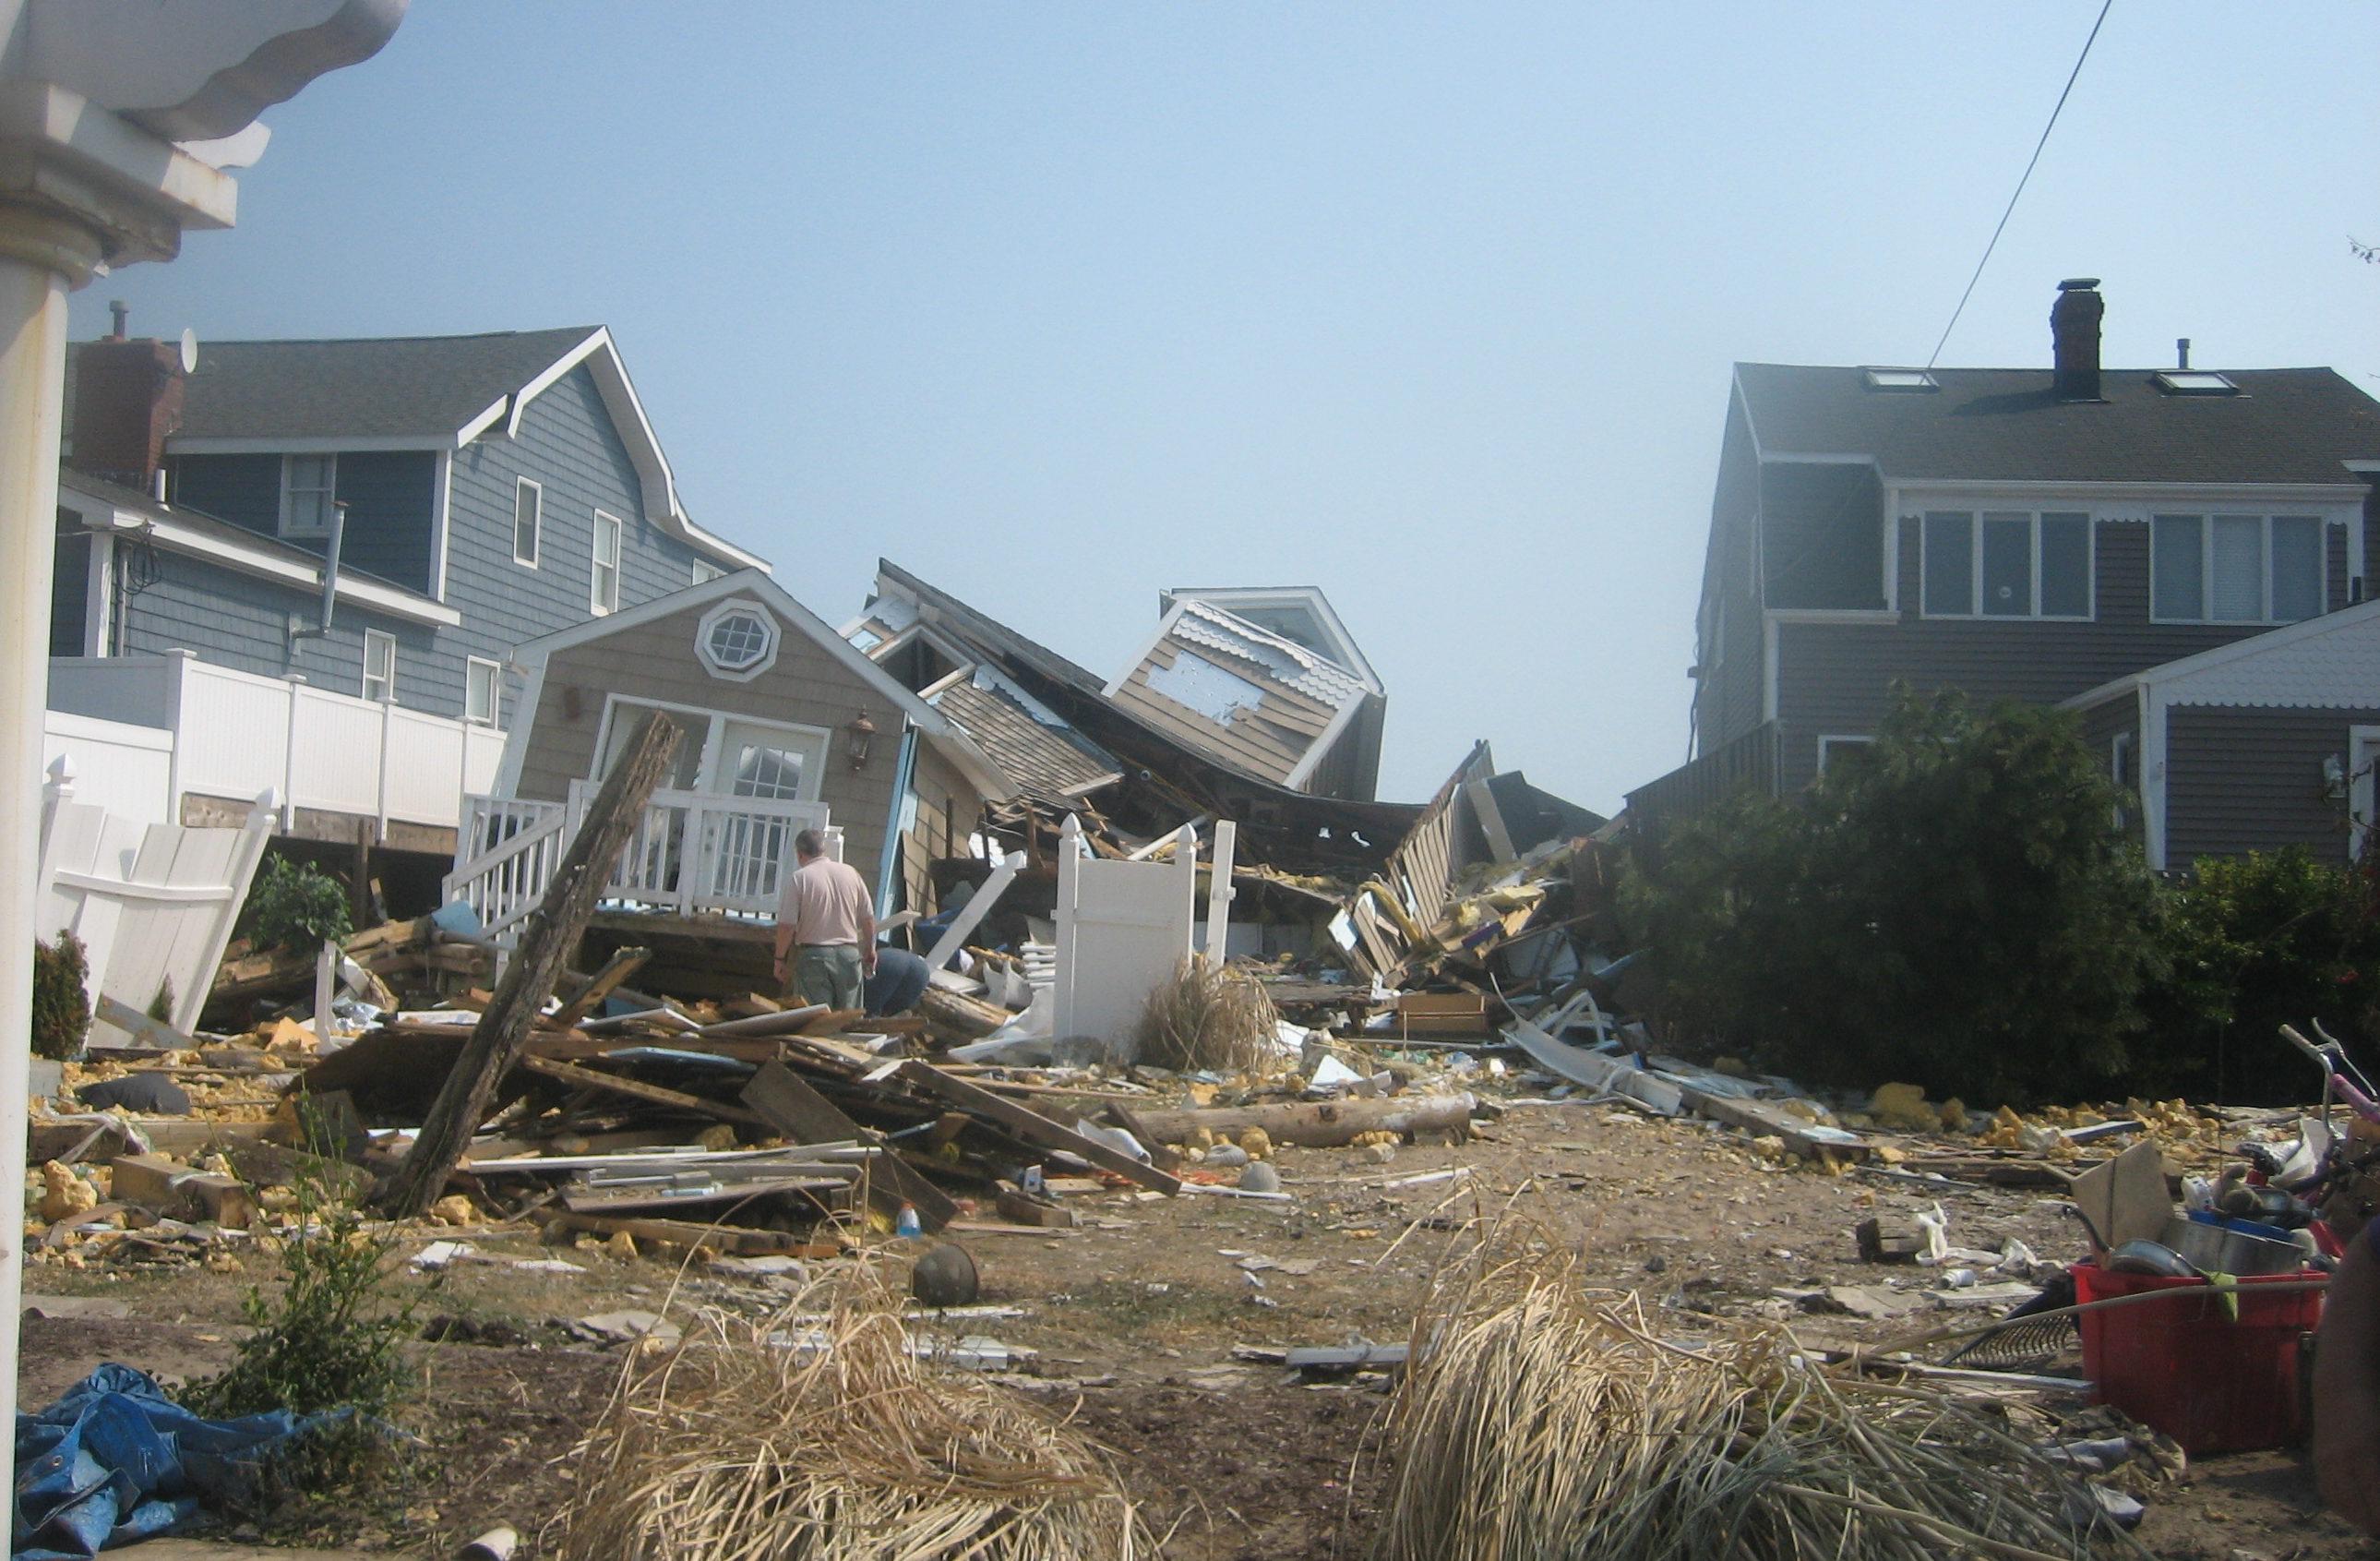 Sandy + 5; Irene + 6: Coastal resilience still elusive and expensive